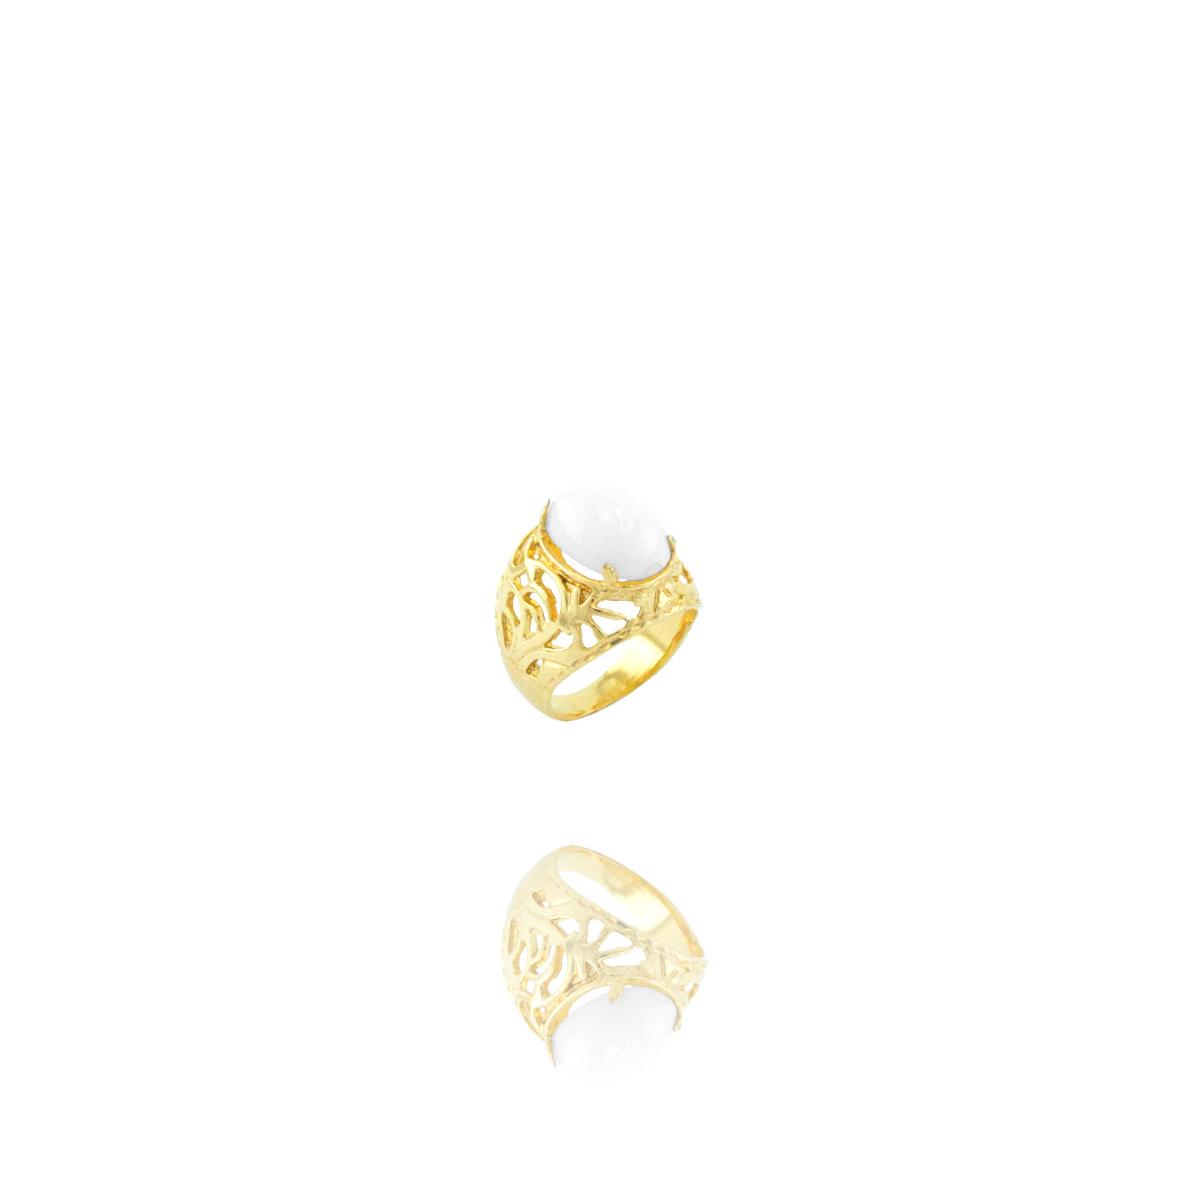 Anel Barbara Strauss Semi Joia Lyon Em Resina Lalique Branco, Rev. Em Ouro Amarelo 18K